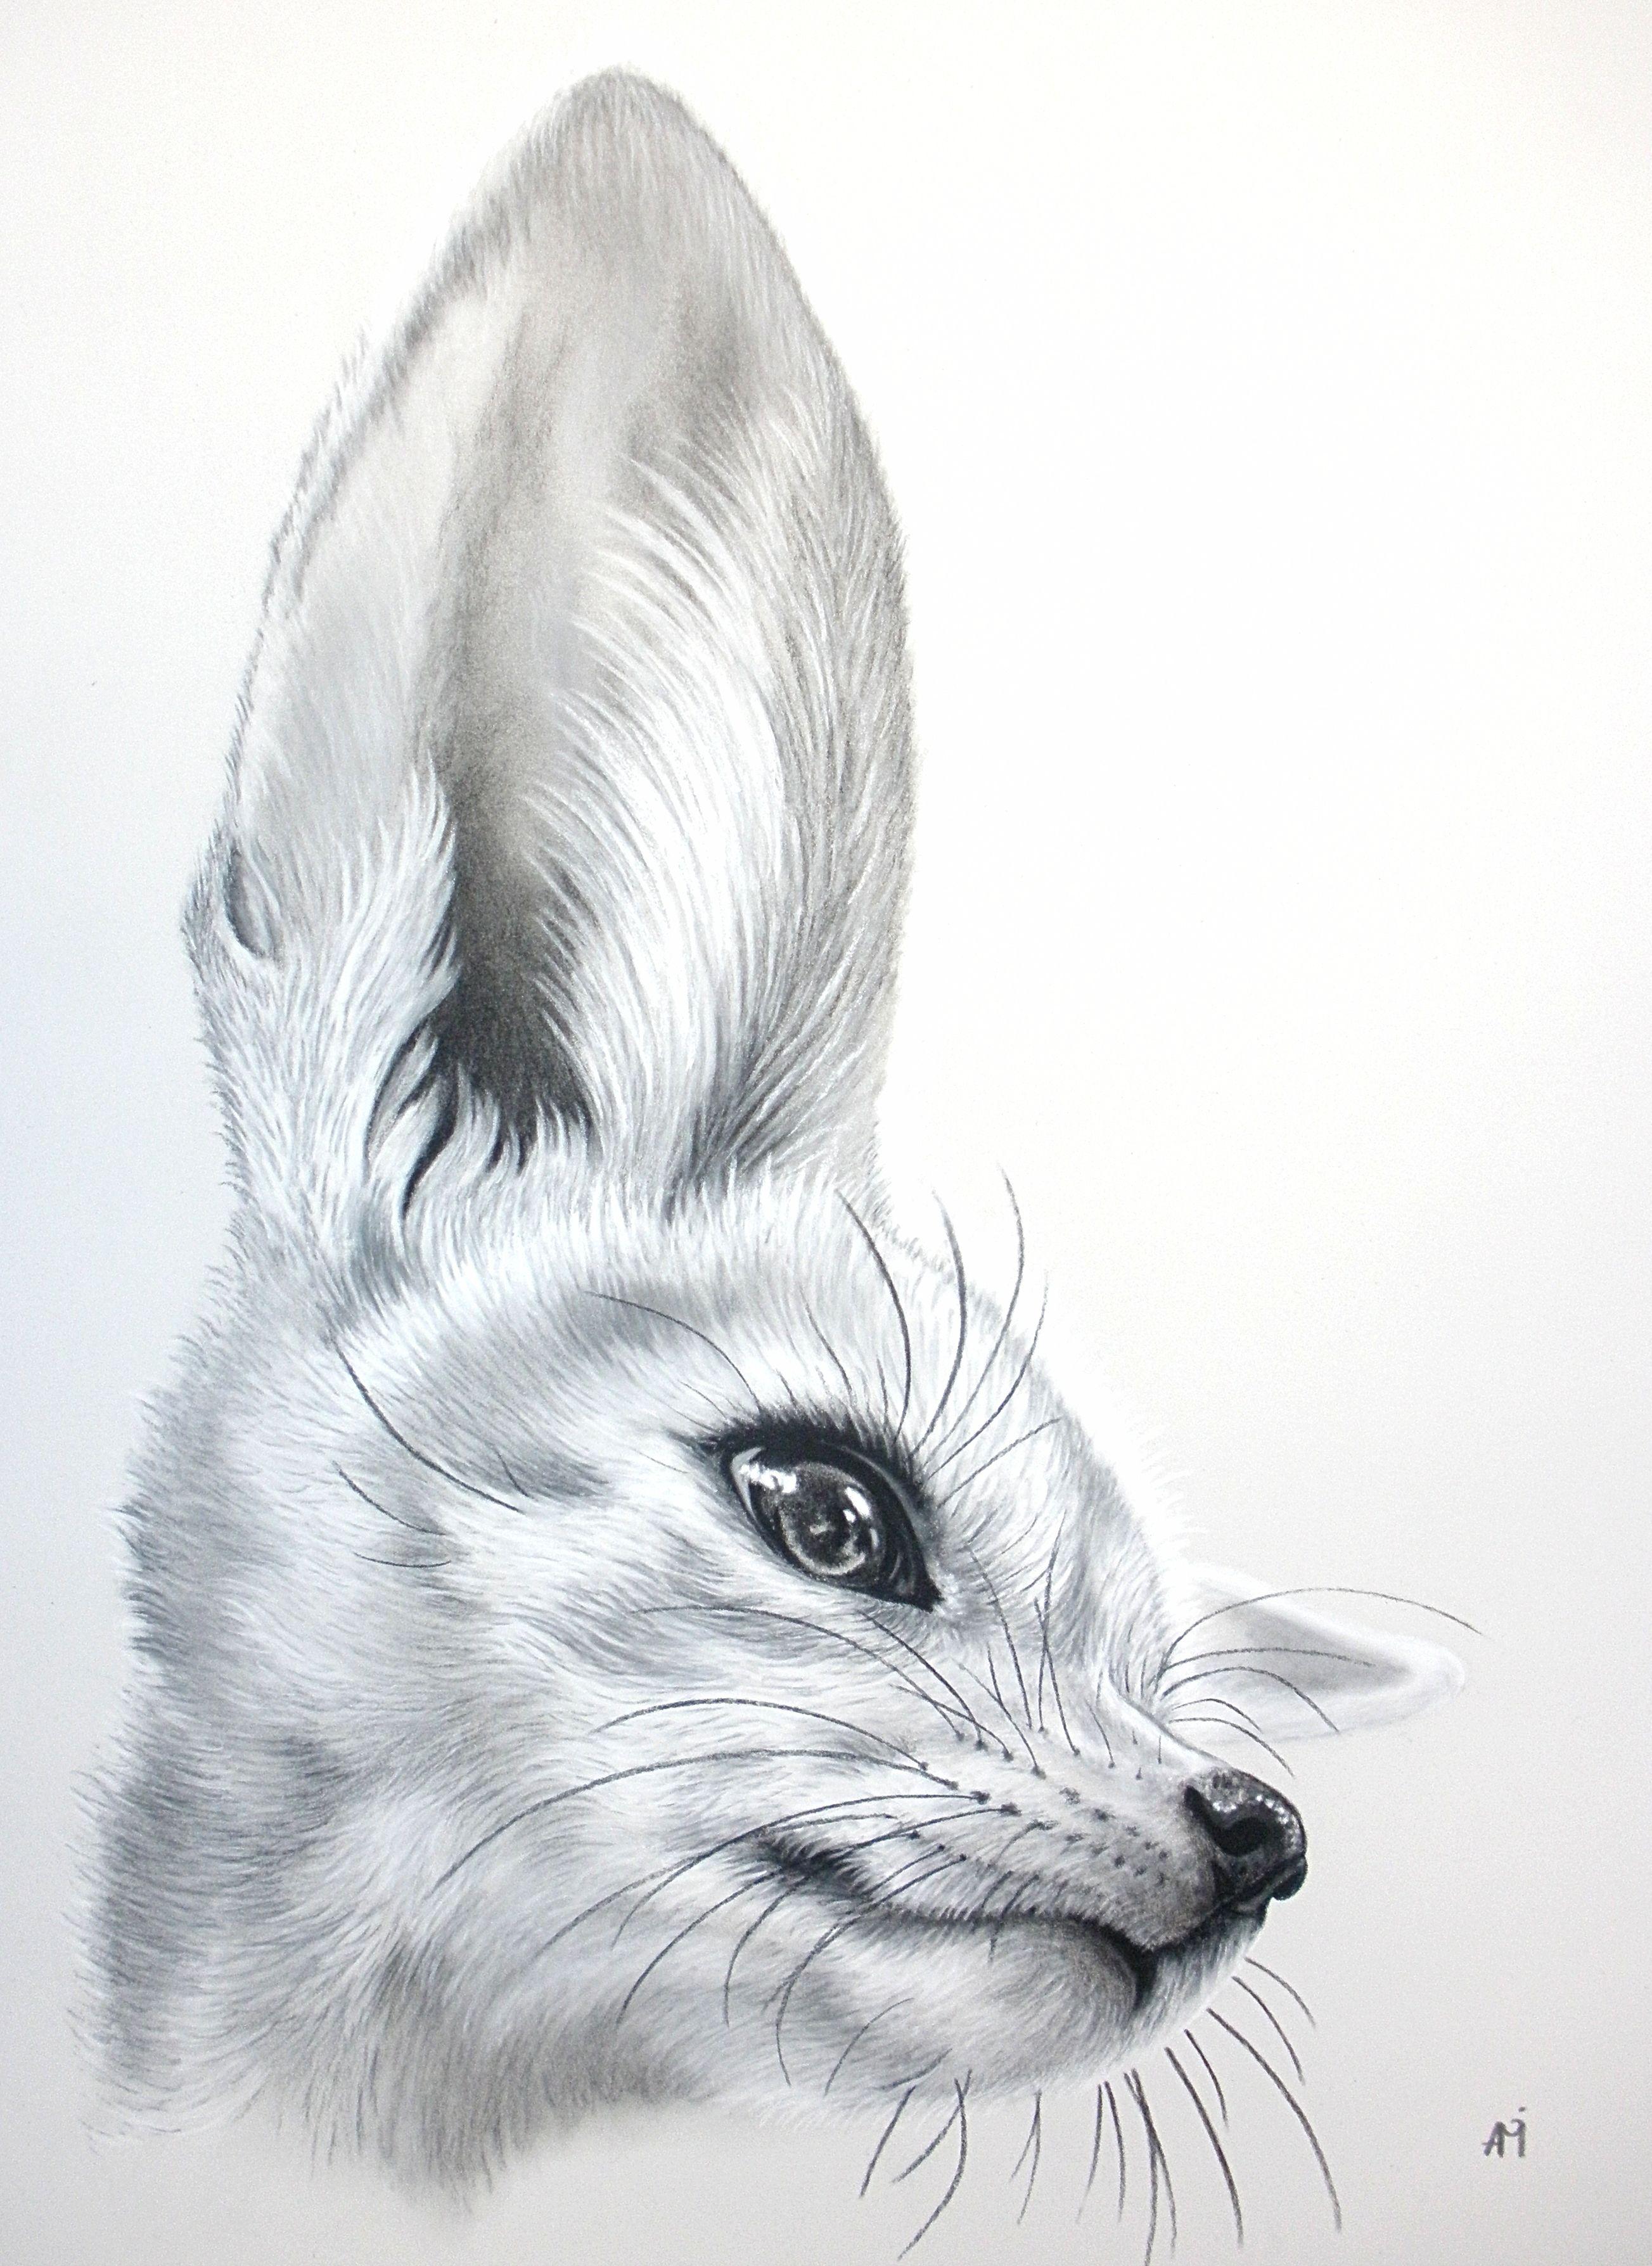 Fennec Fox Drawing Audrey Migeotte Jpg 2607 3576 Dibujos De